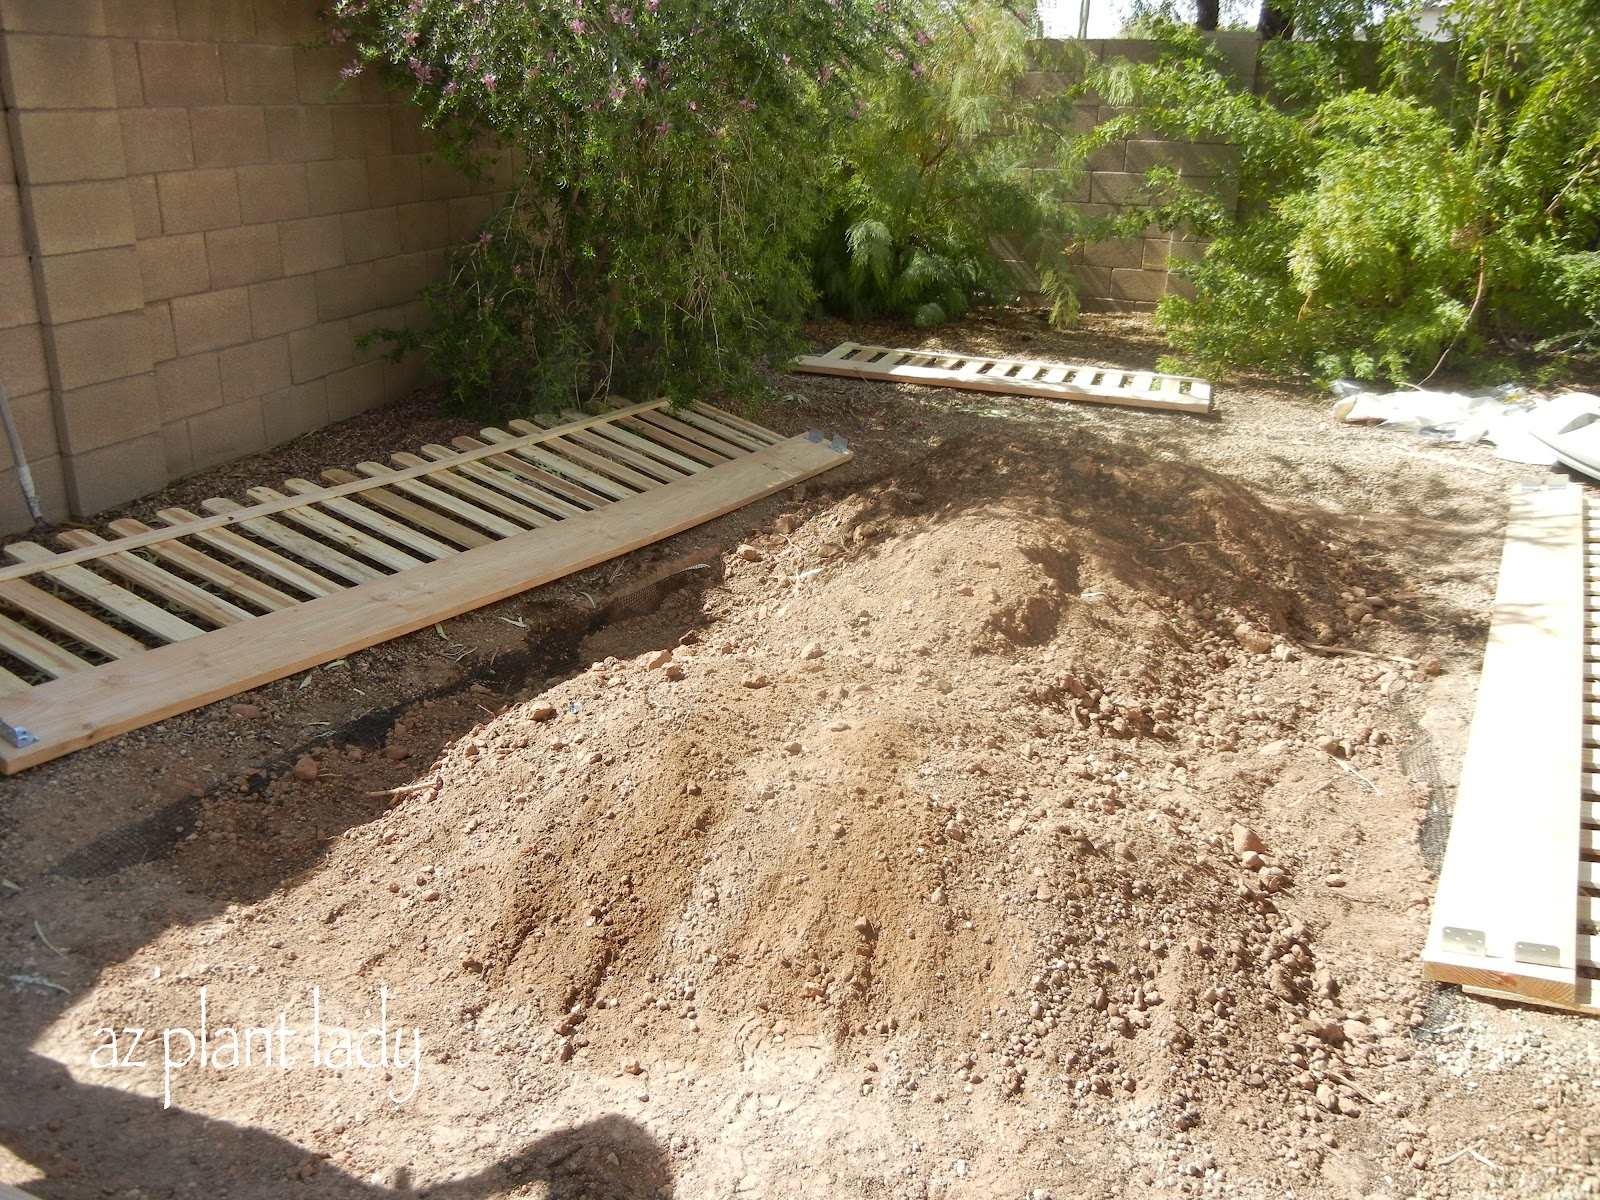 New Vegetable Garden Finally Finished! - Ramblings from a Desert Garden